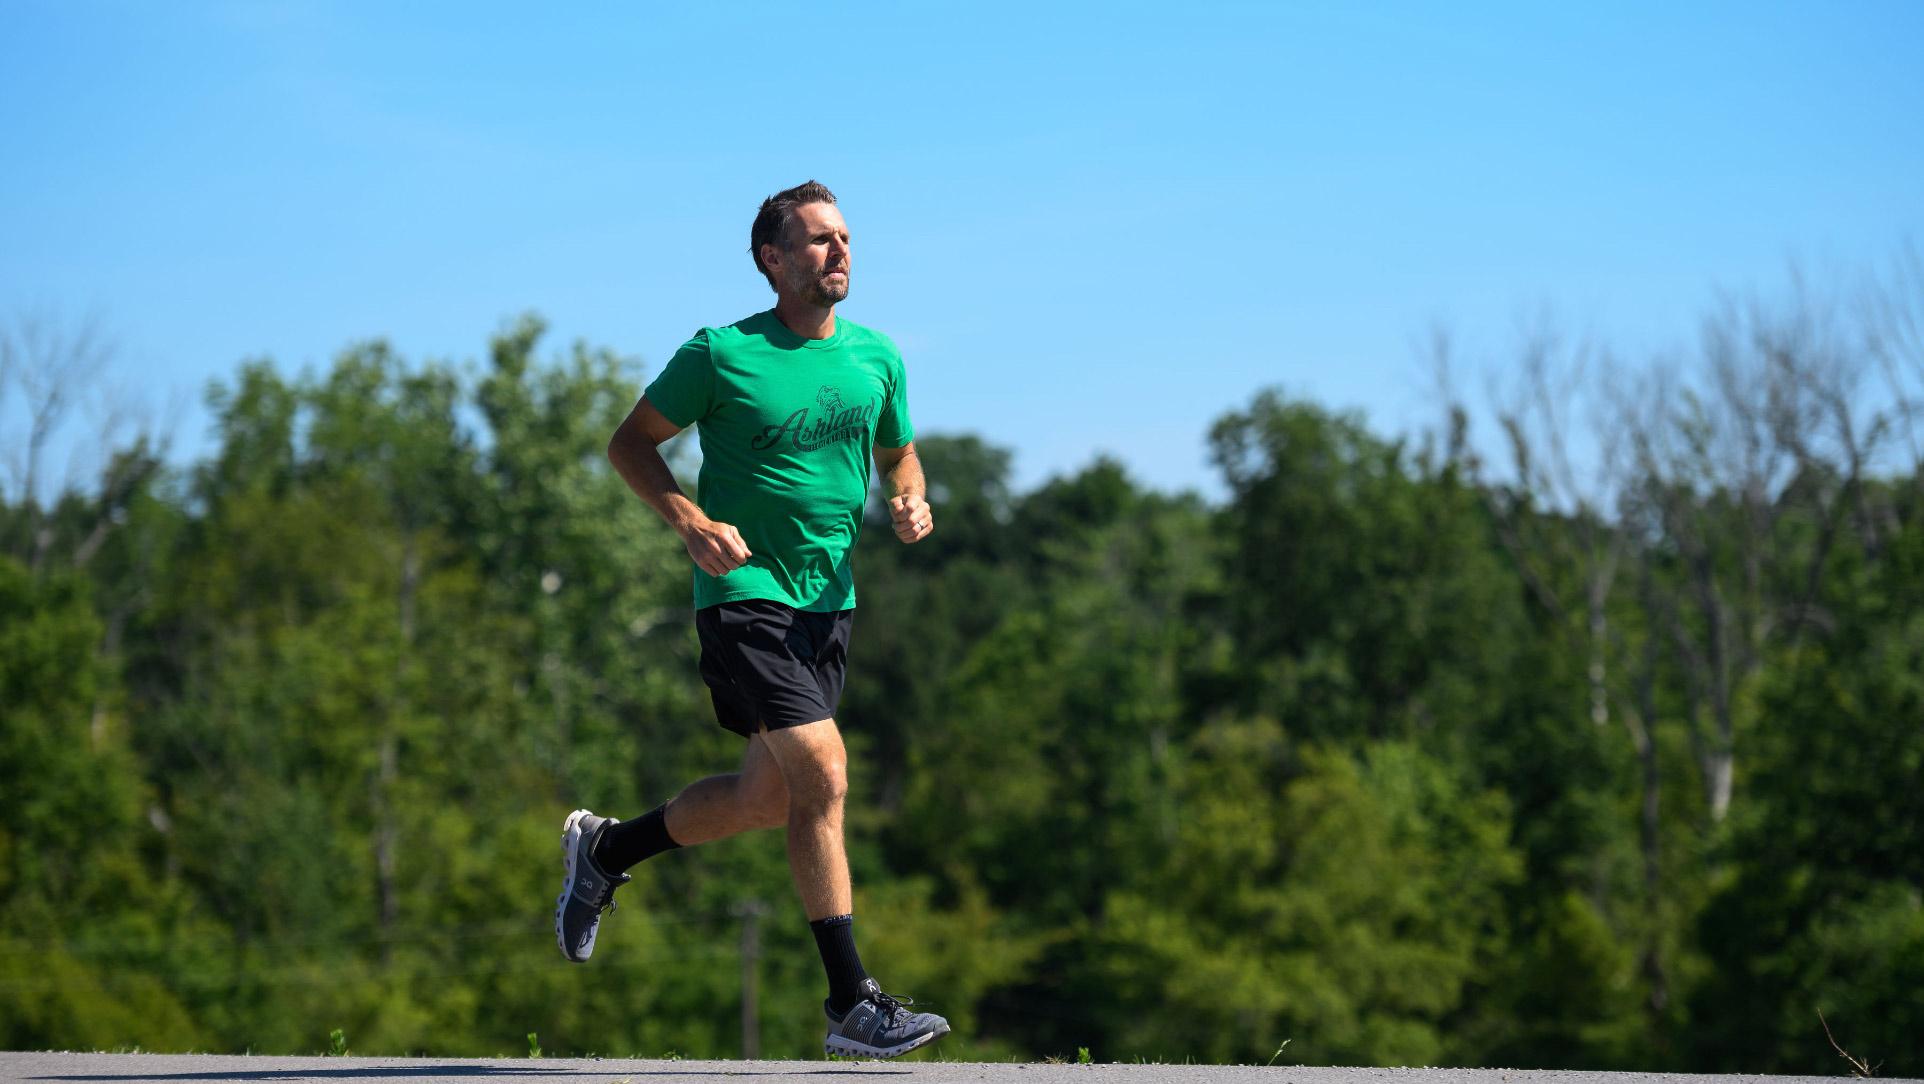 Ryan runs outside. He is wearing a green shirt, black shorts, and tennis shoes.